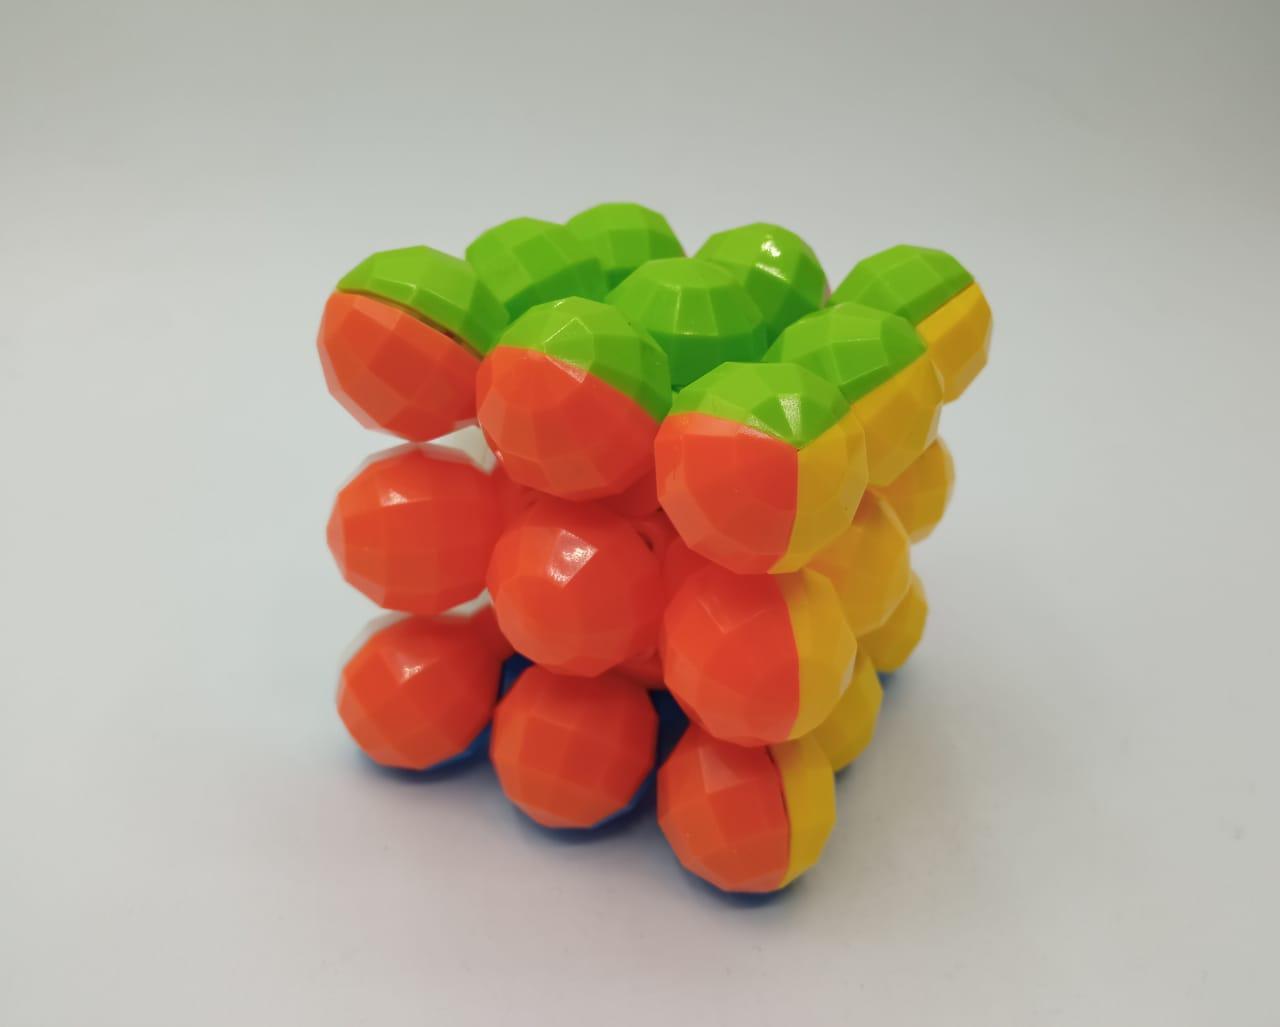 Cubo Magico: Esferas Poligonal Cube (LHO52B) - Magic Cube